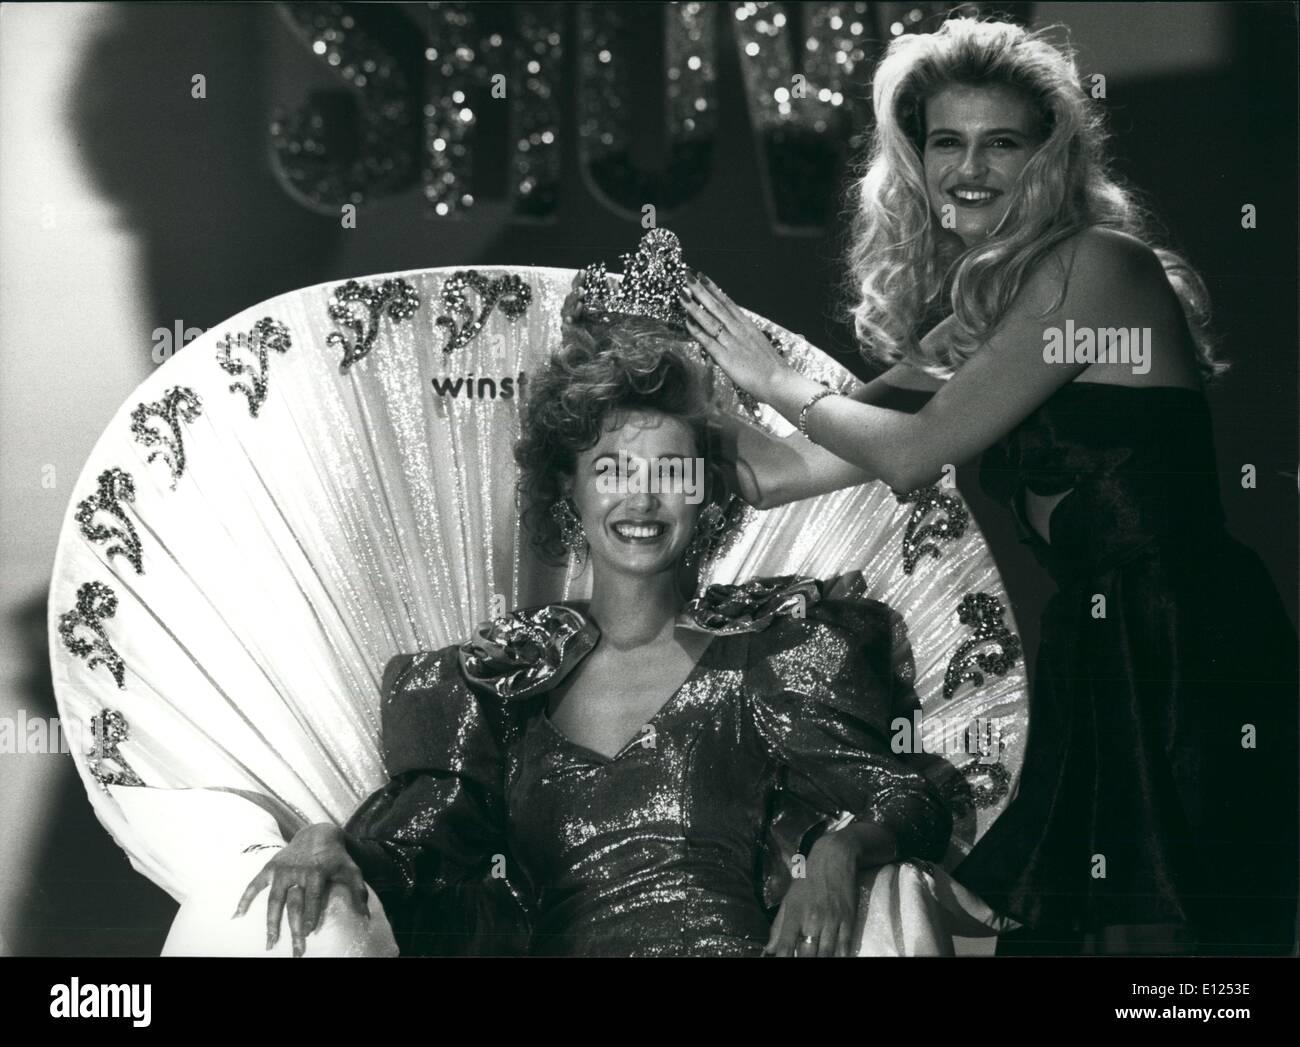 Jun. 06, 1991 - Miss Switzerland 1991: 21years old Sandra Aegerter receives the crown miss Switzerland 91 from herStock Photo